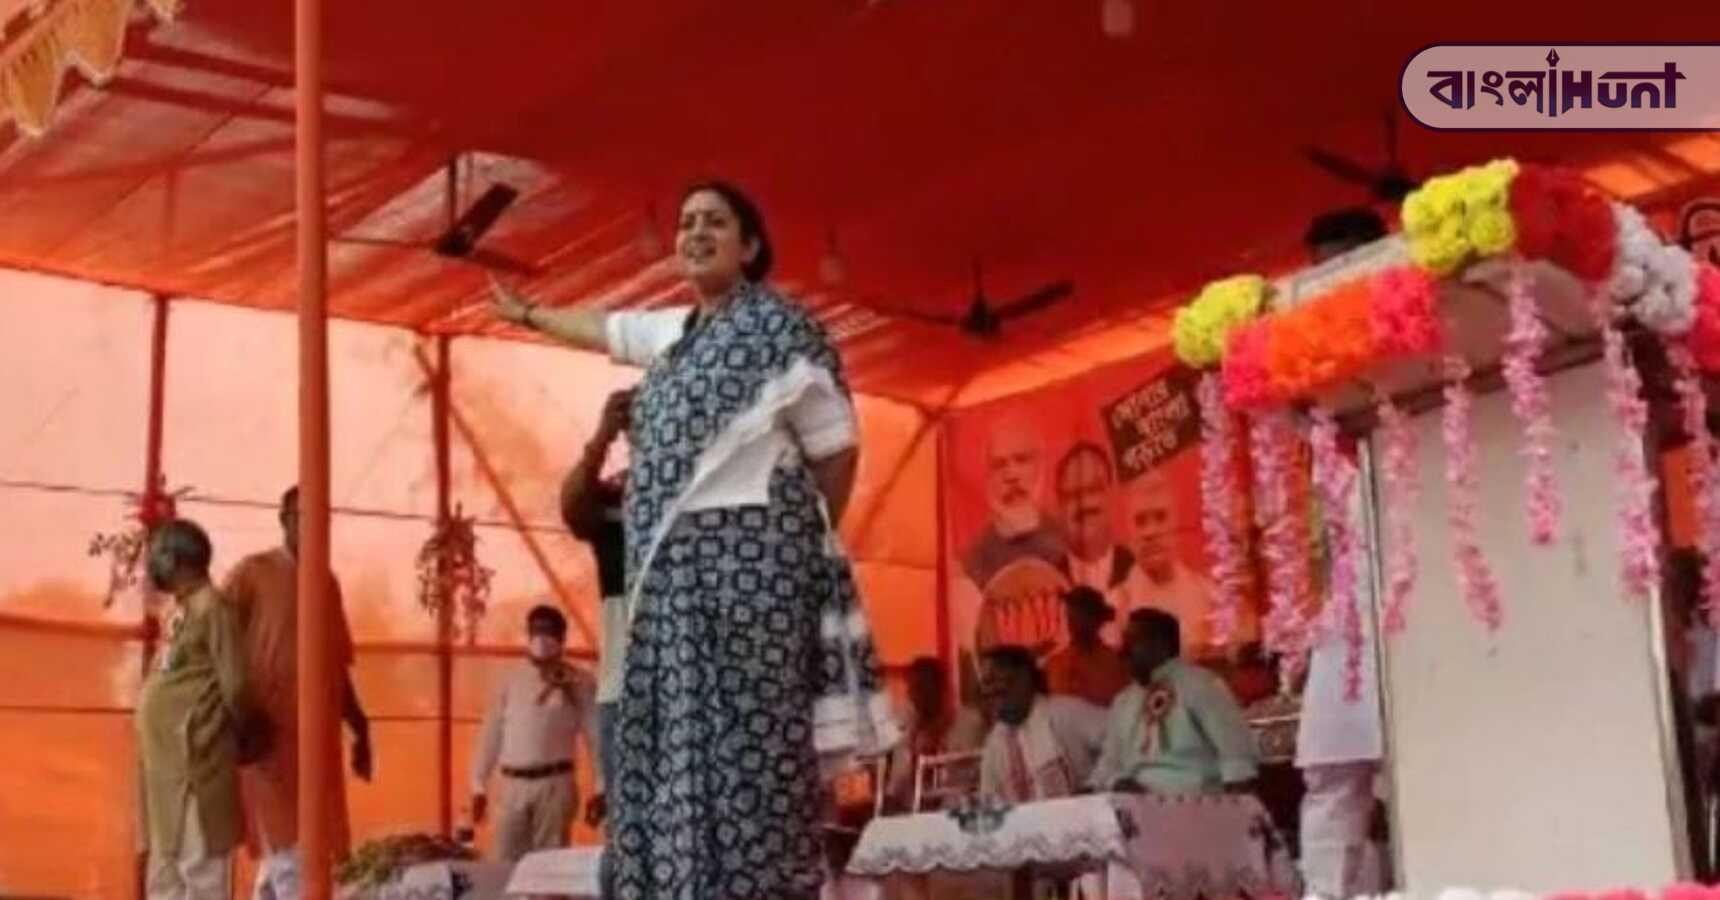 Smriti Irani addressed the gathering without electricity